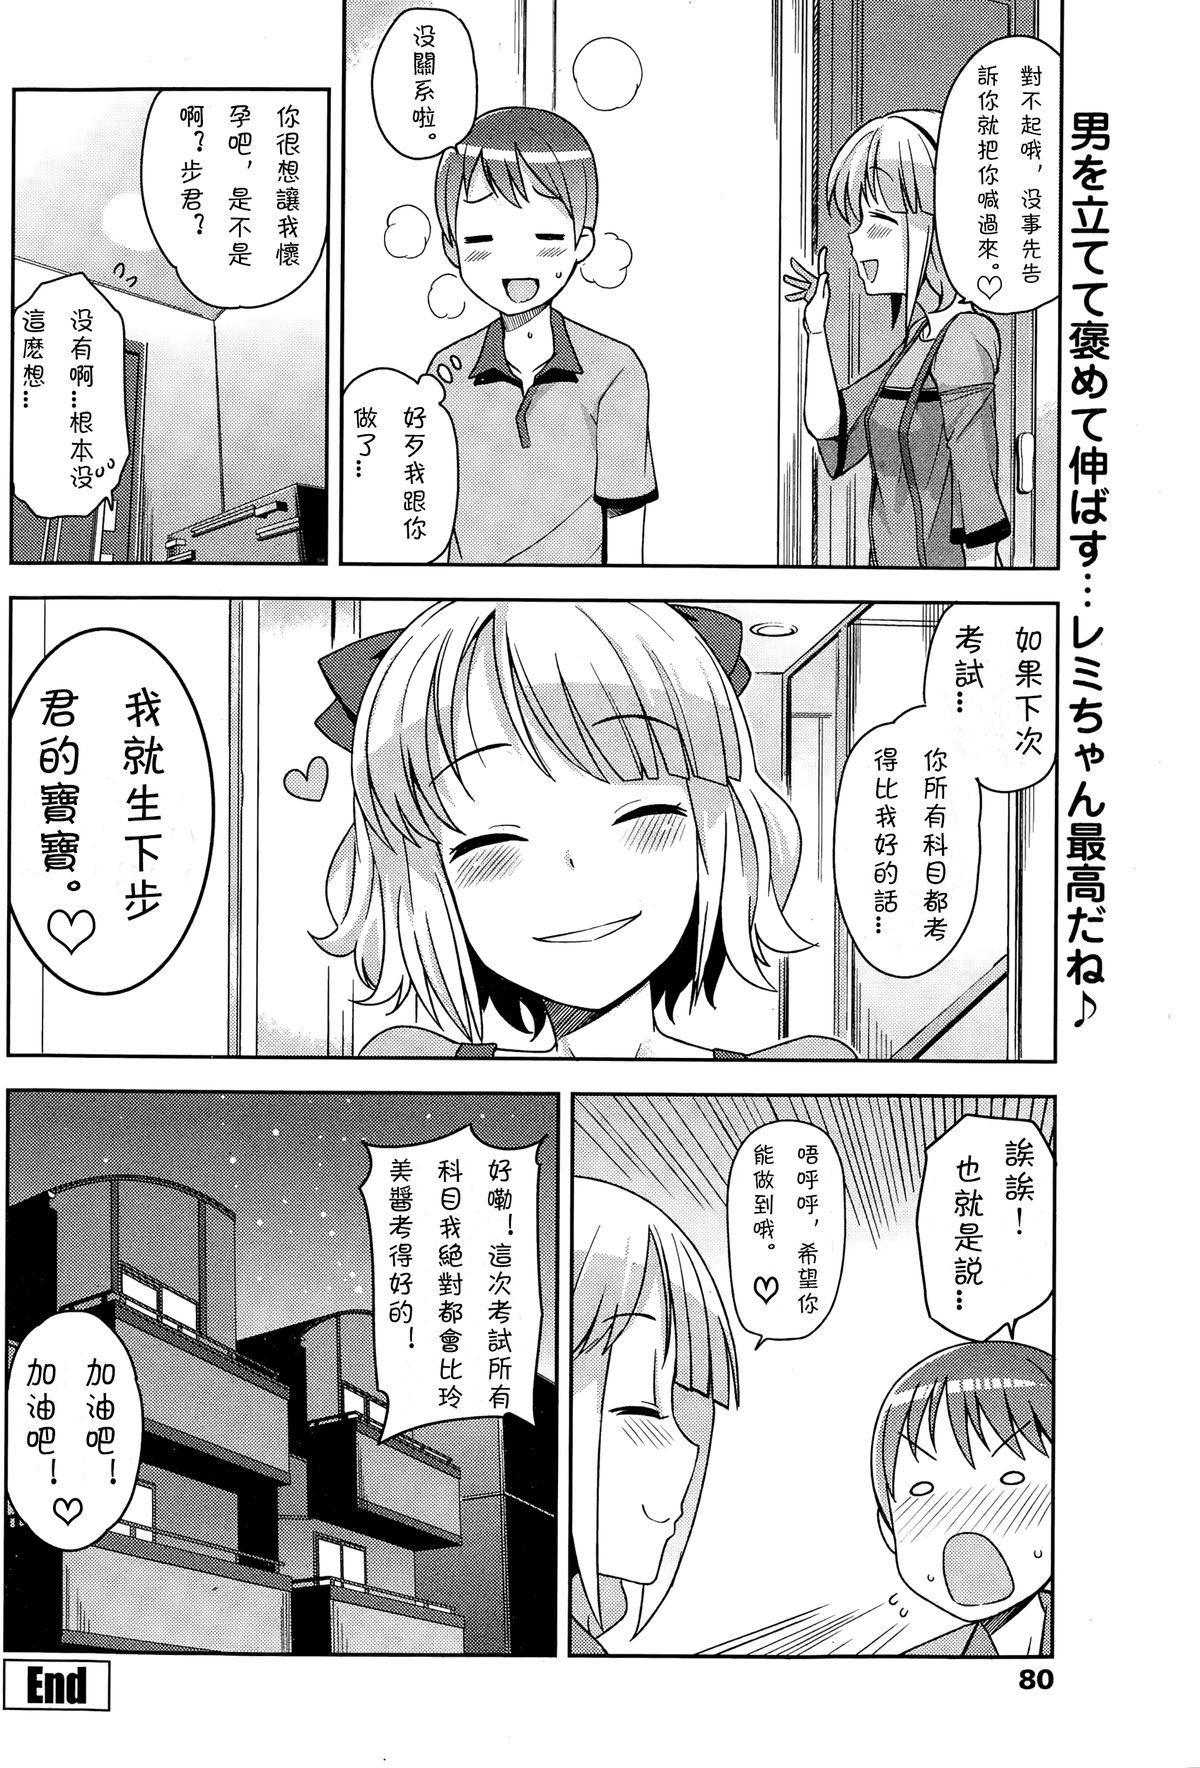 Watashi ga Suki na Aitsu no xxx | Having XXX with the one I love Ch. 1-2 19